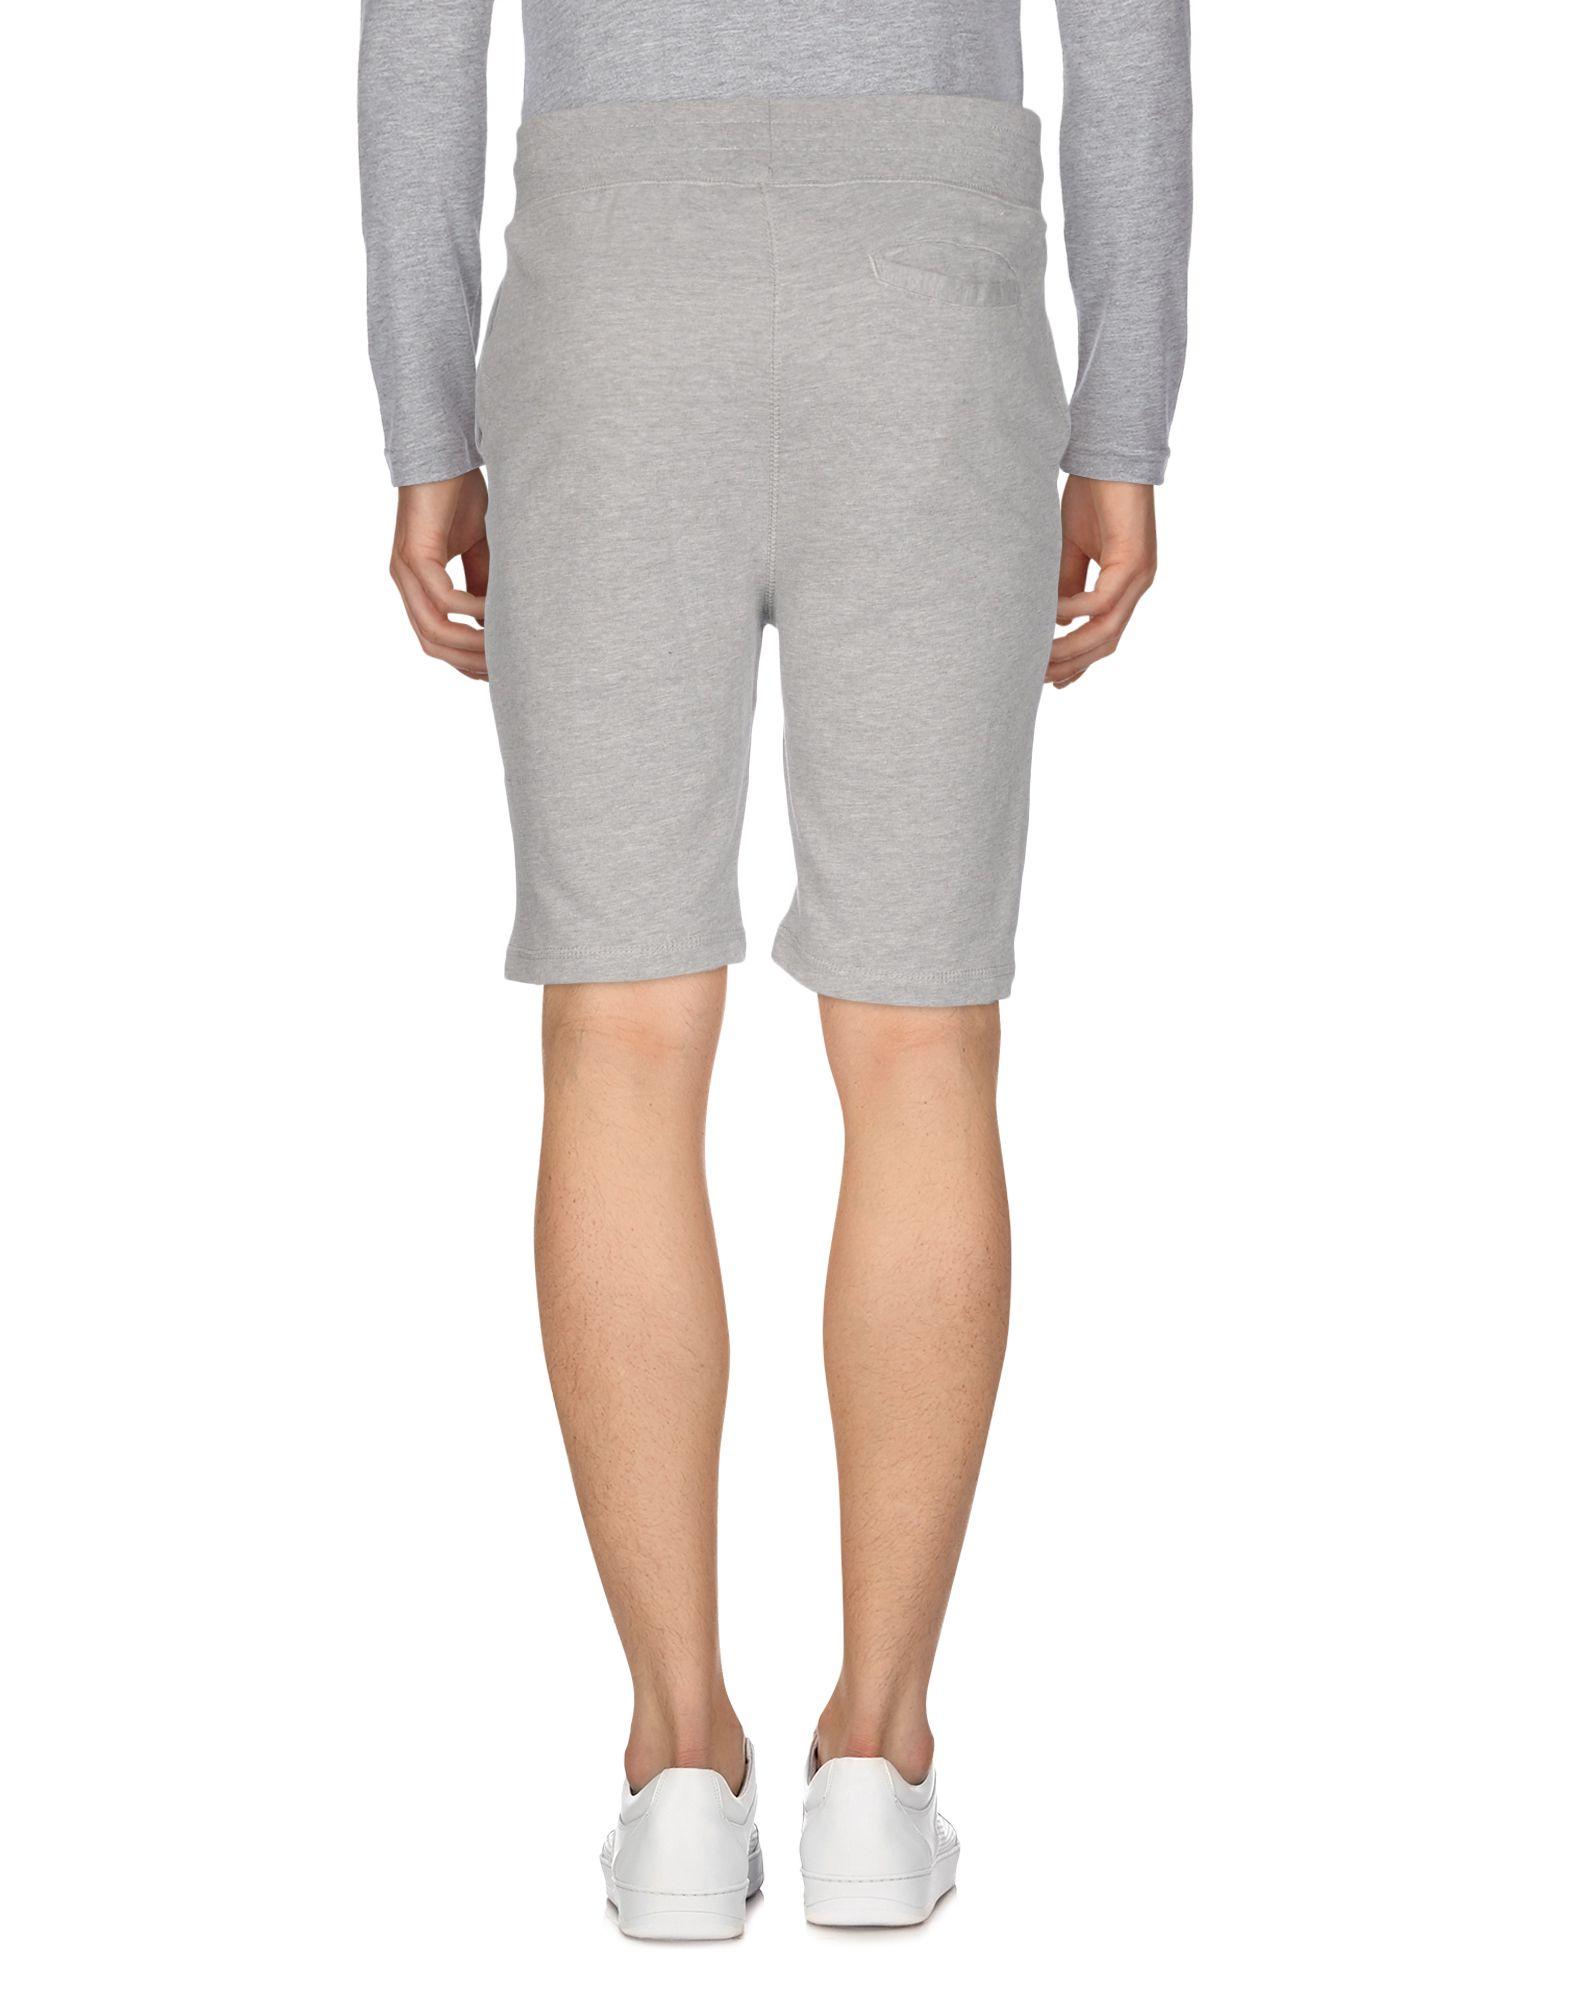 Pantalone Felpa Felpa Felpa Undefeated Uomo - 13124642QN 0fd2a1